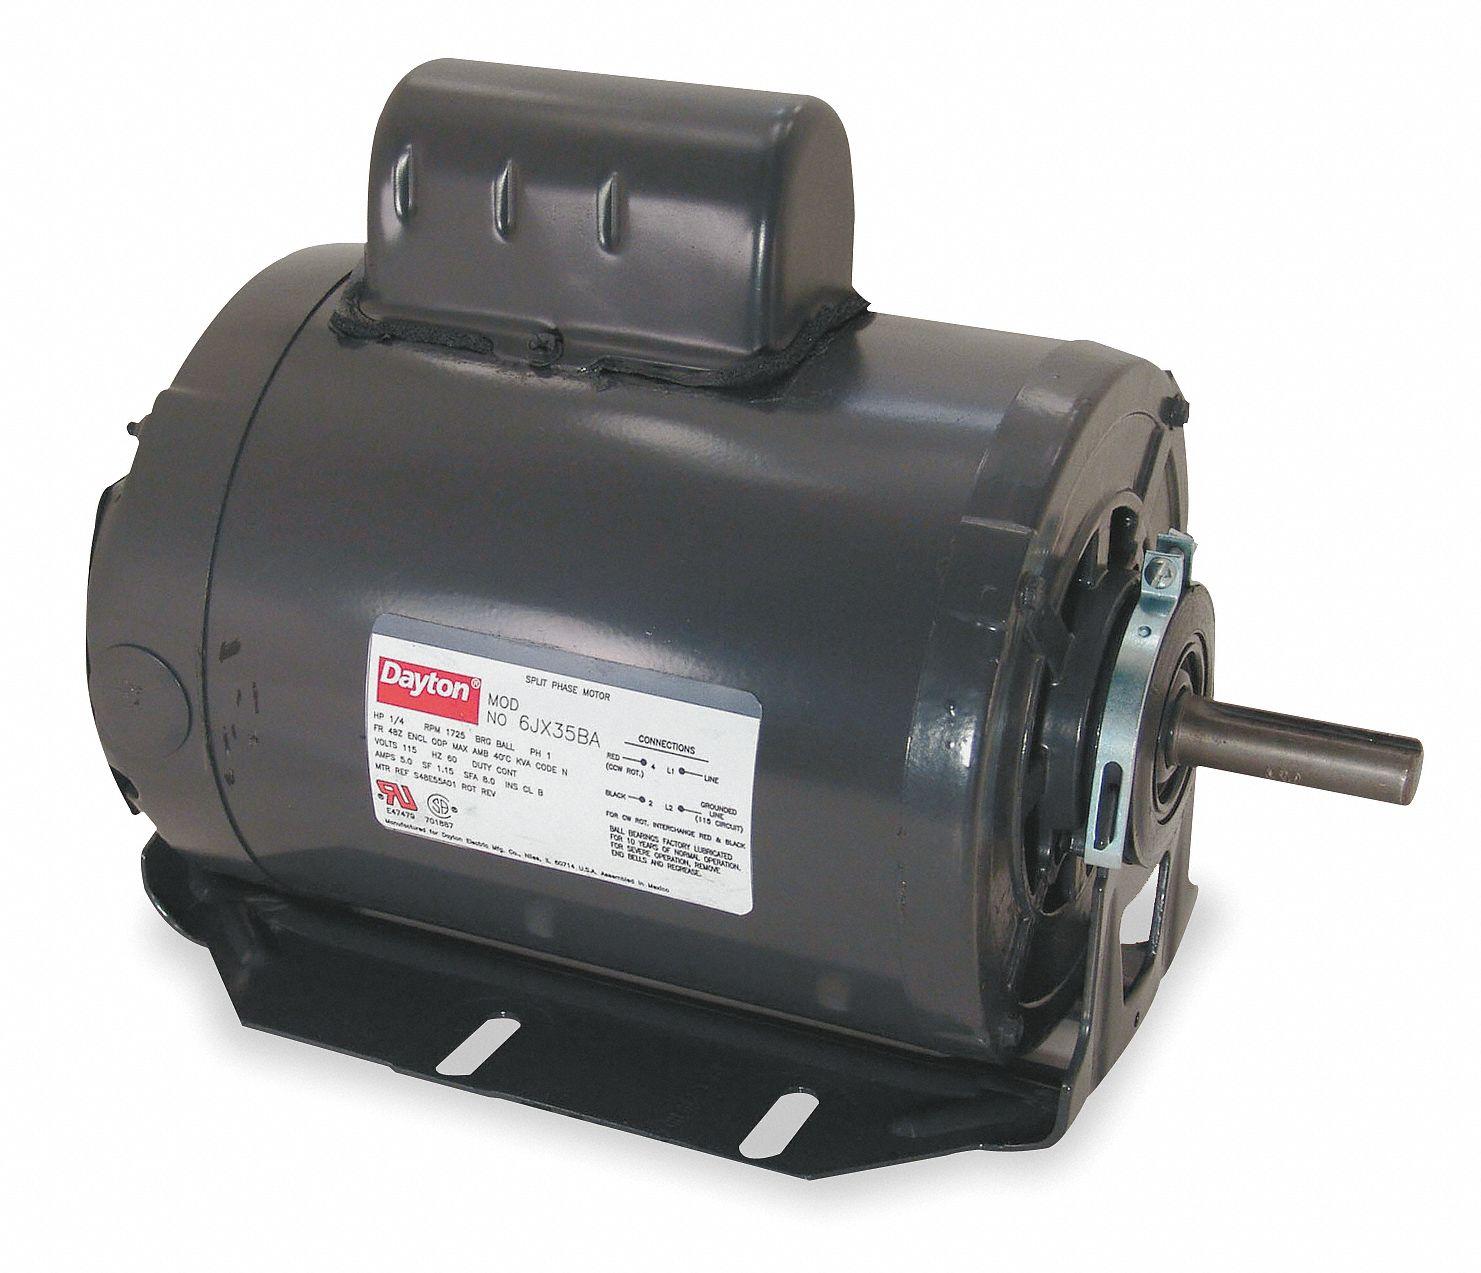 hight resolution of dayton 3 4 hp general purpose motor capacitor start 3450 nameplate rpm voltage 115 230 frame 56 6k346 6k346 grainger